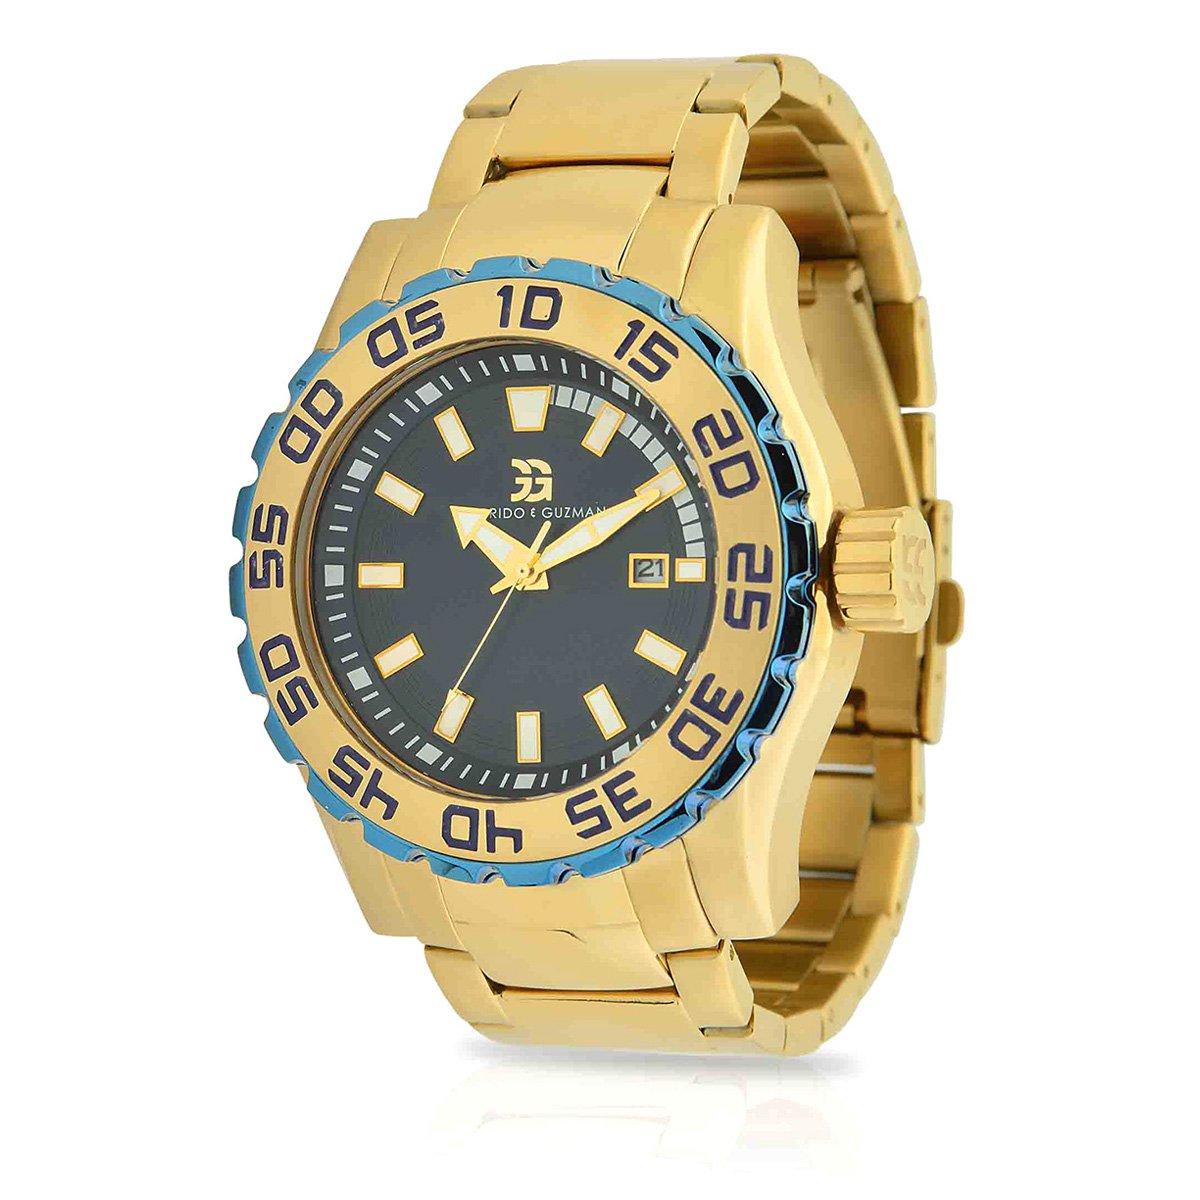 e4c5b04f4ef Relógio Garrido e Guzman Analógico 2046GSG Masculino - Dourado - Compre  Agora